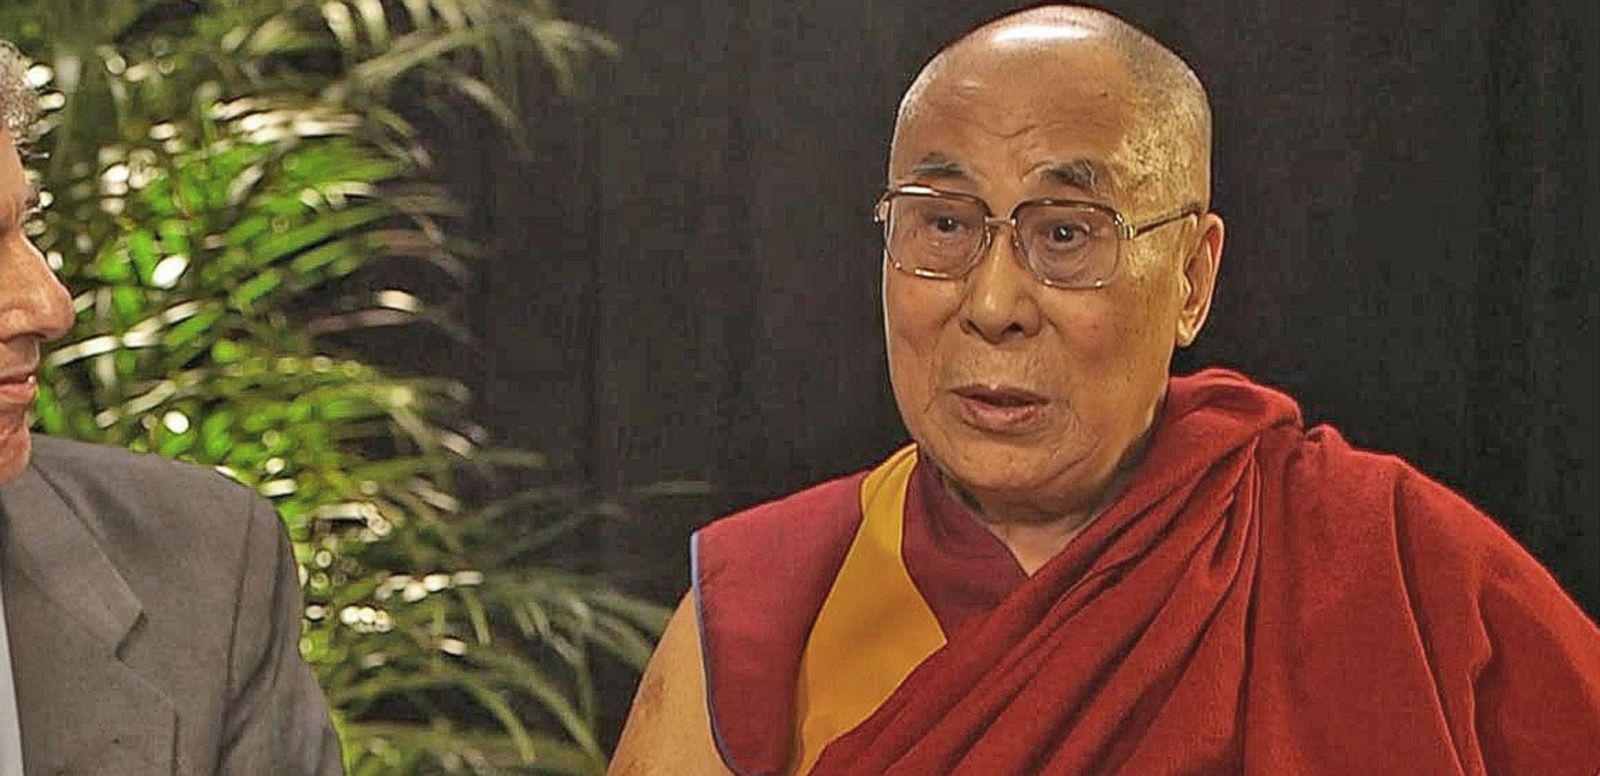 VIDEO: 10% Happier with Dan Harris with the Dalai Lama